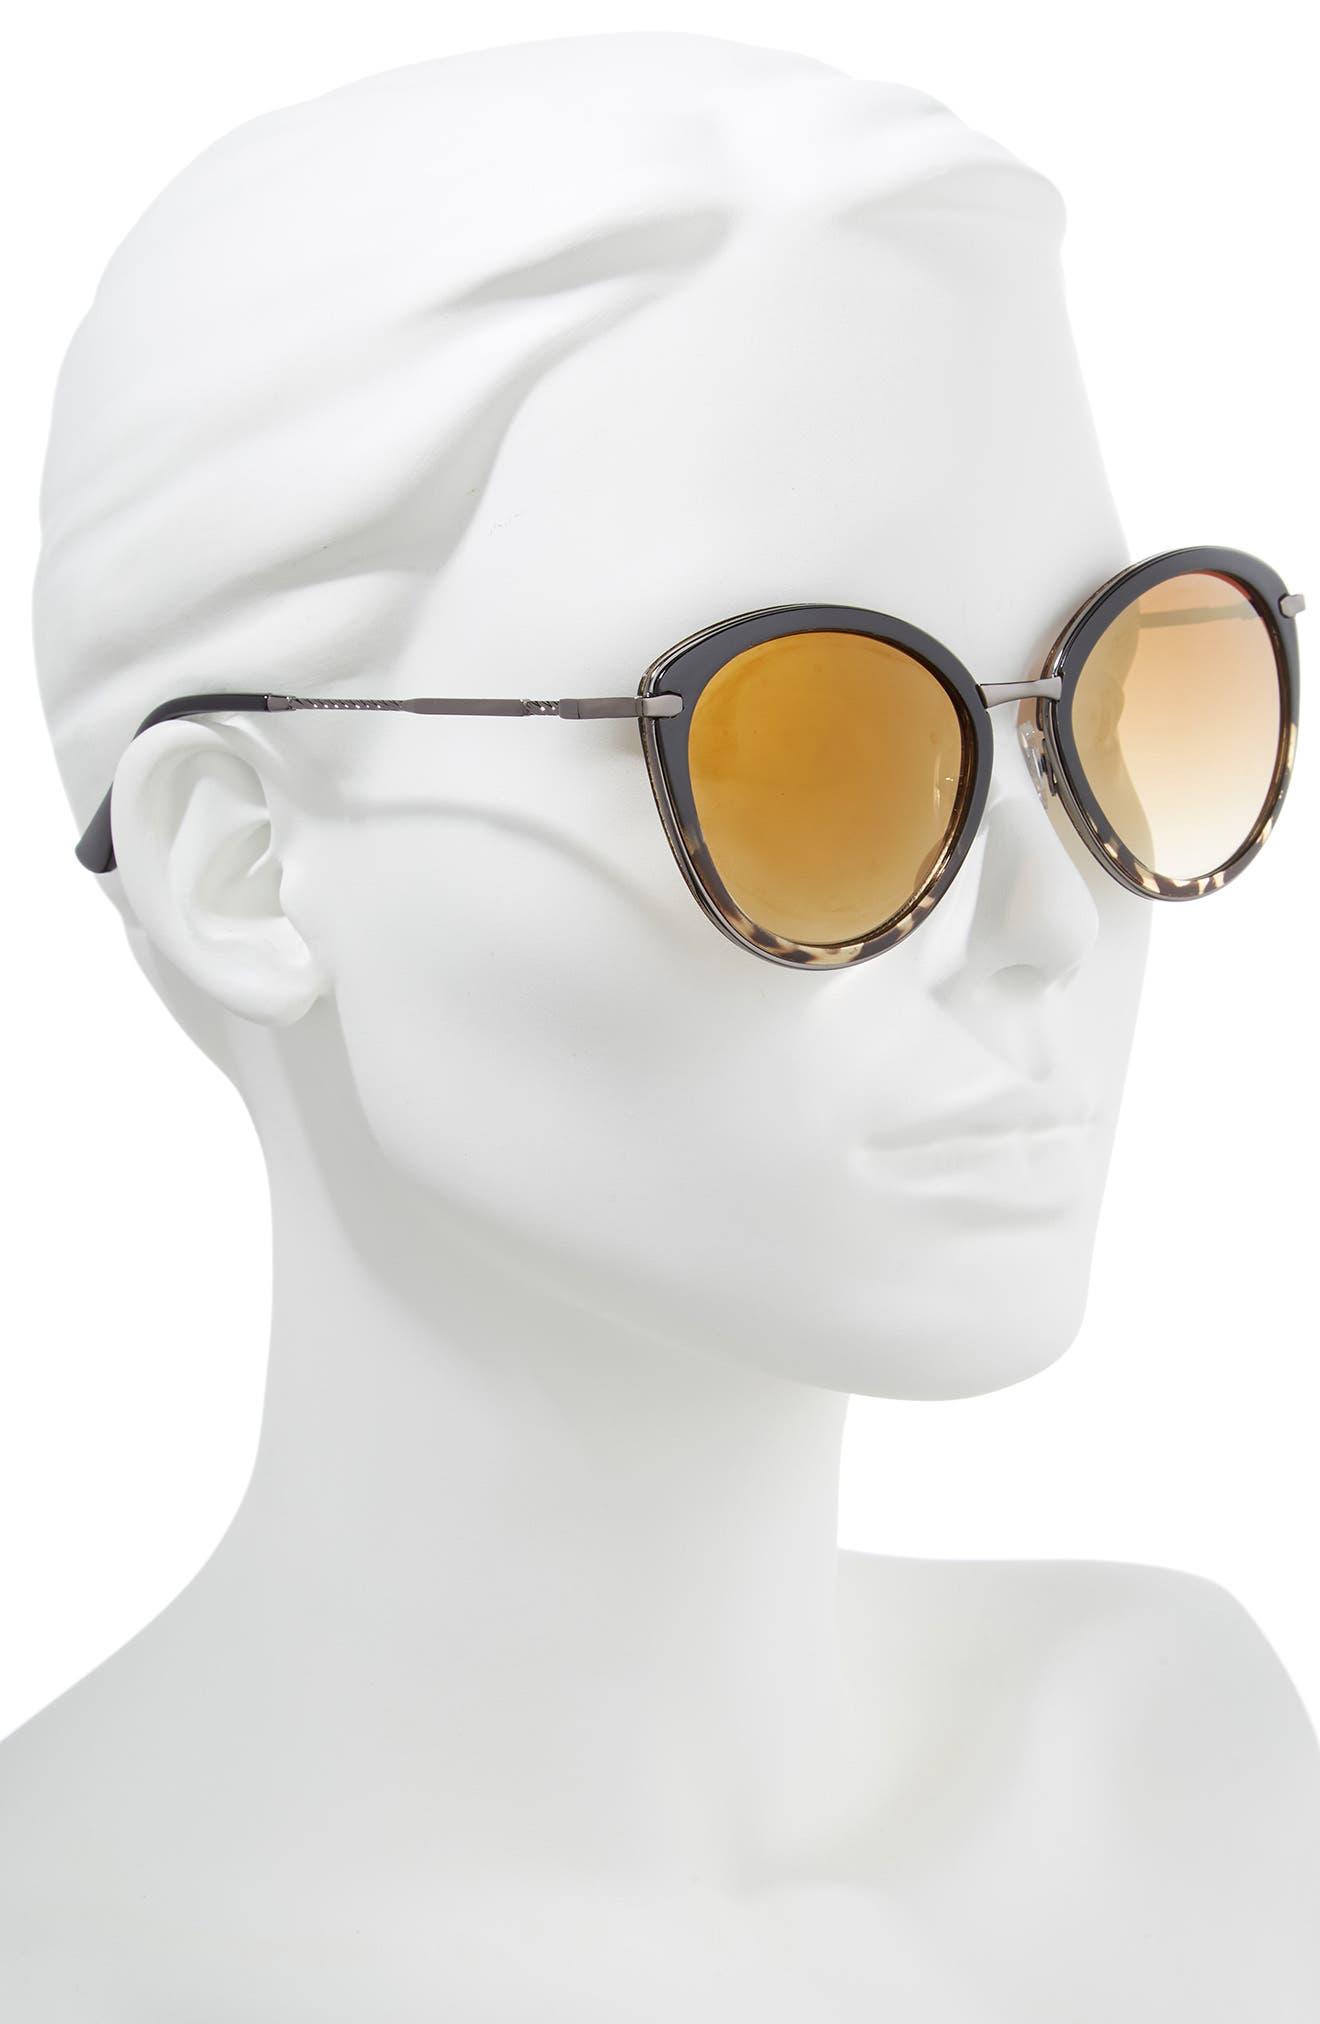 54mm Round Sunglasses,                             Alternate thumbnail 2, color,                             Black/ Tort